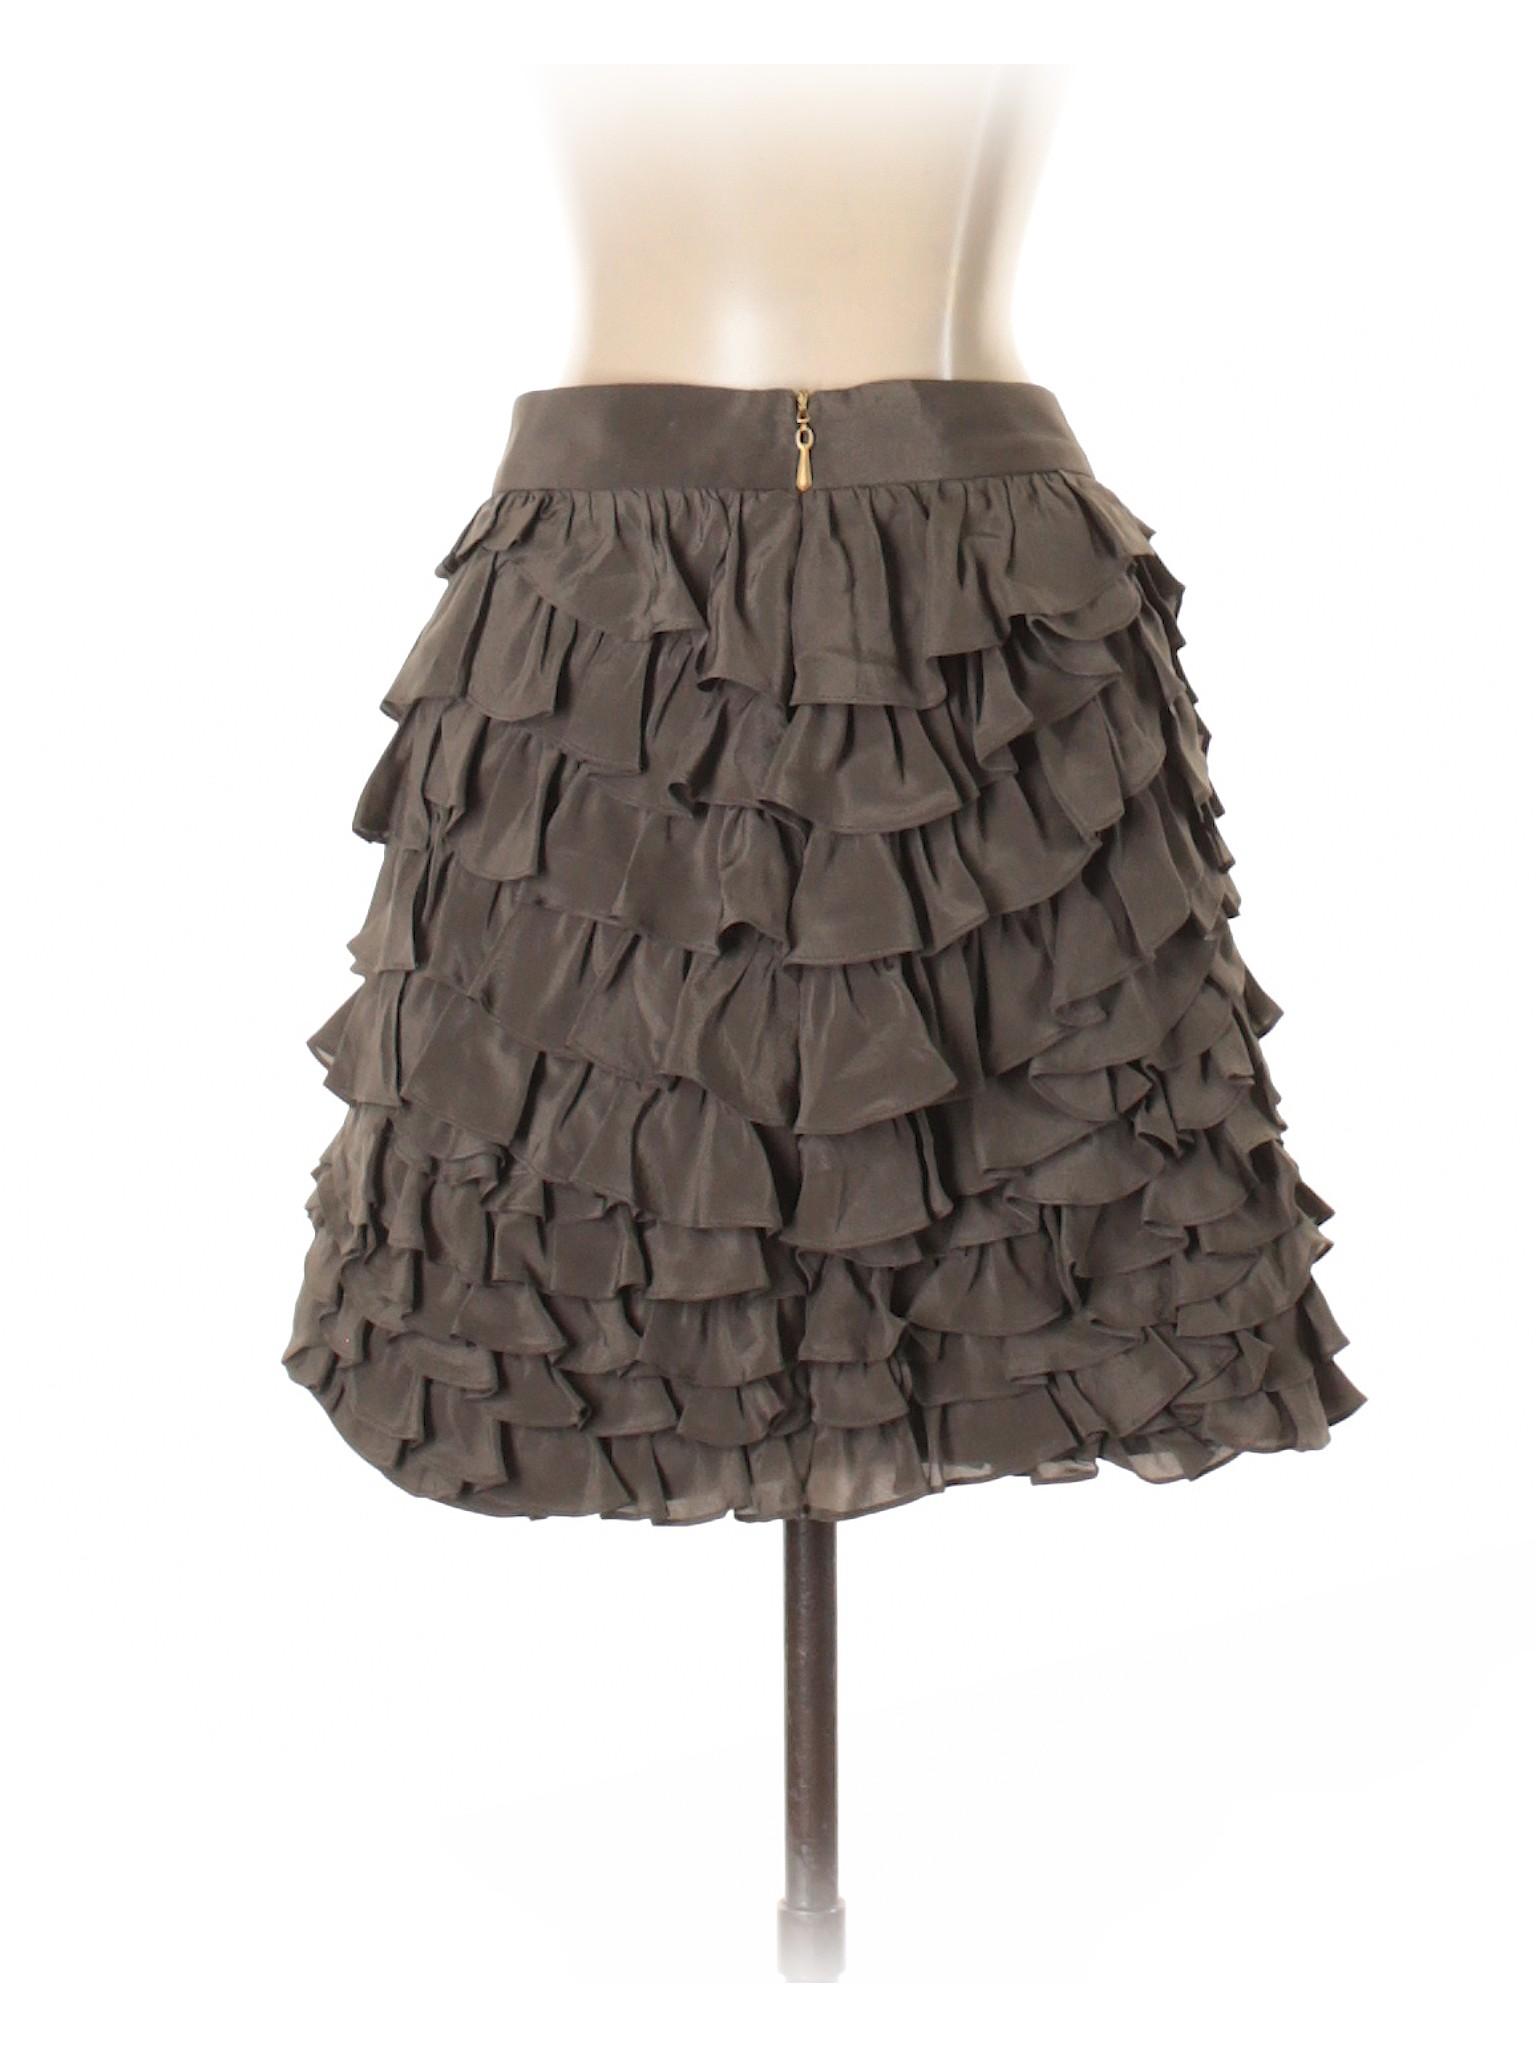 Boutique Boutique Casual Leifsdottir Leifsdottir Skirt B0qdnwYU0a